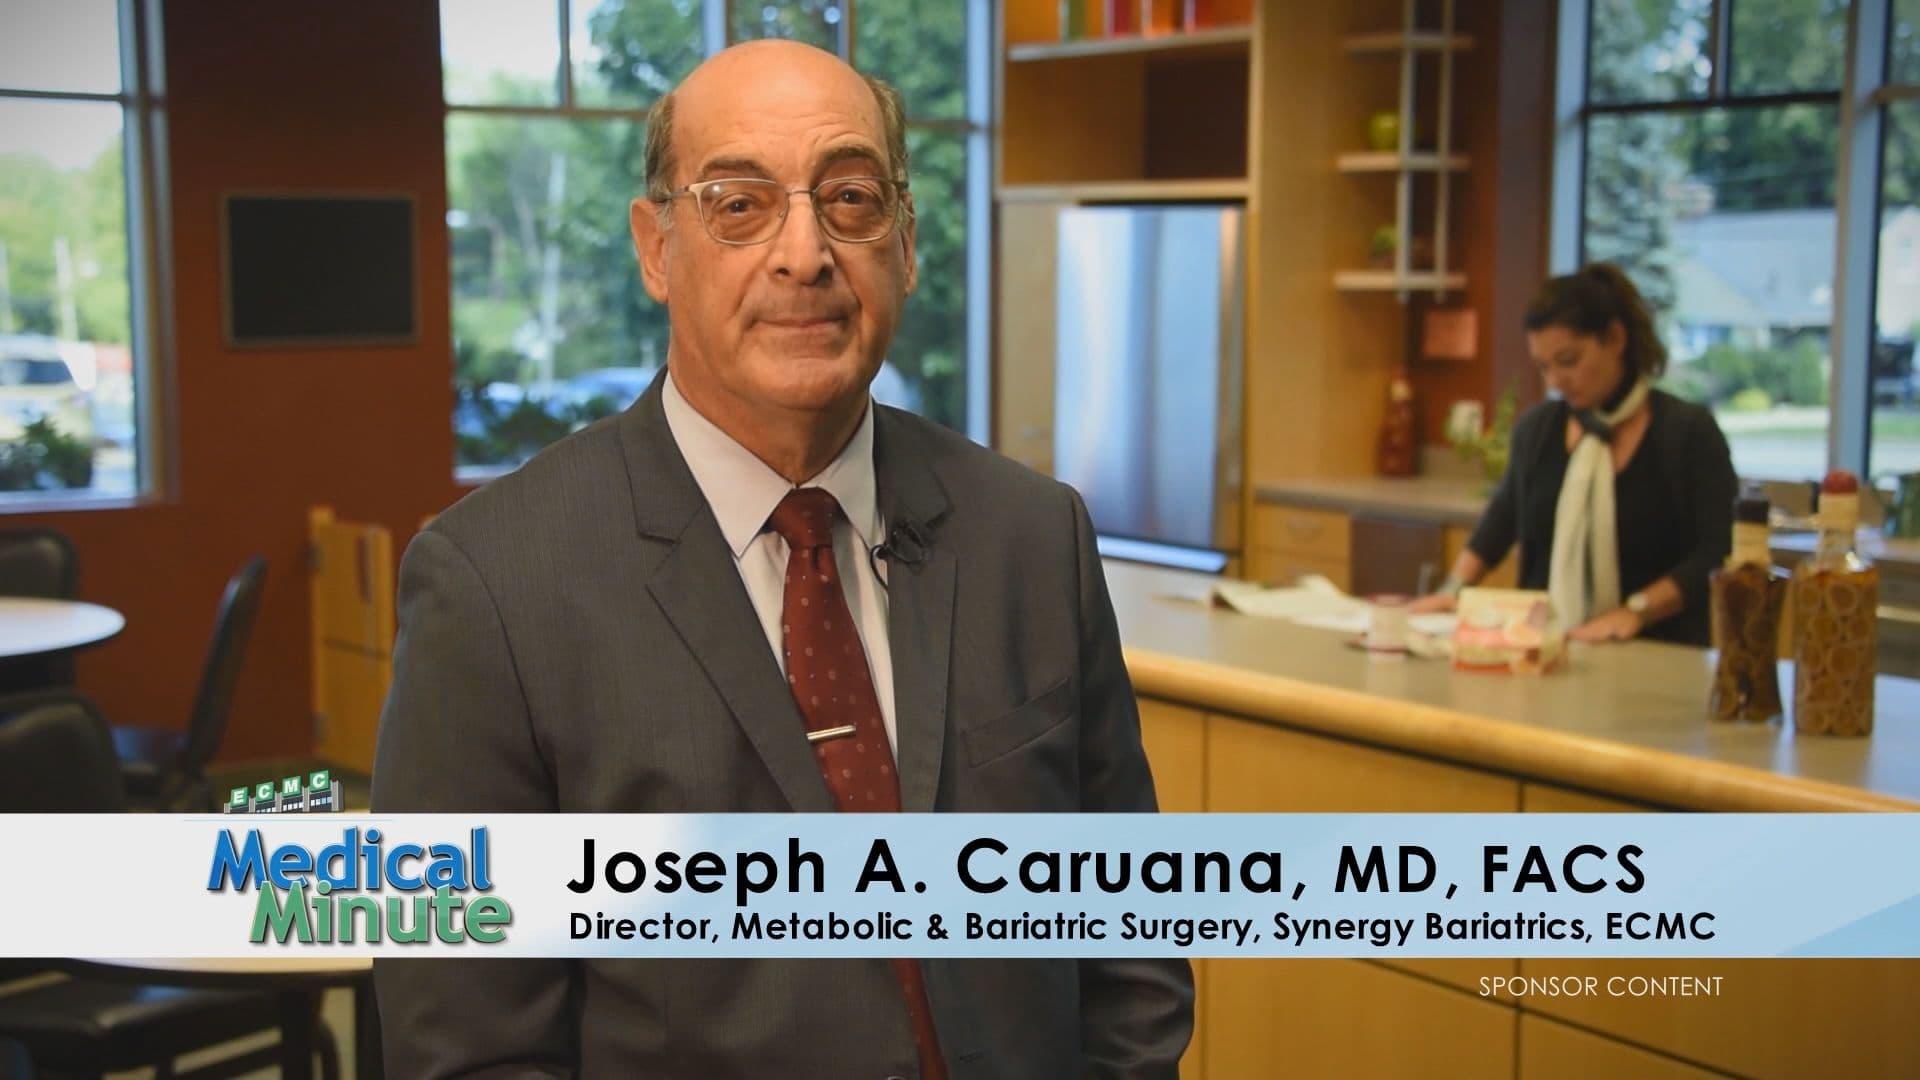 ECMCMedicalMinute Dr.Caruana MetabolicSurgery 012119 STILL